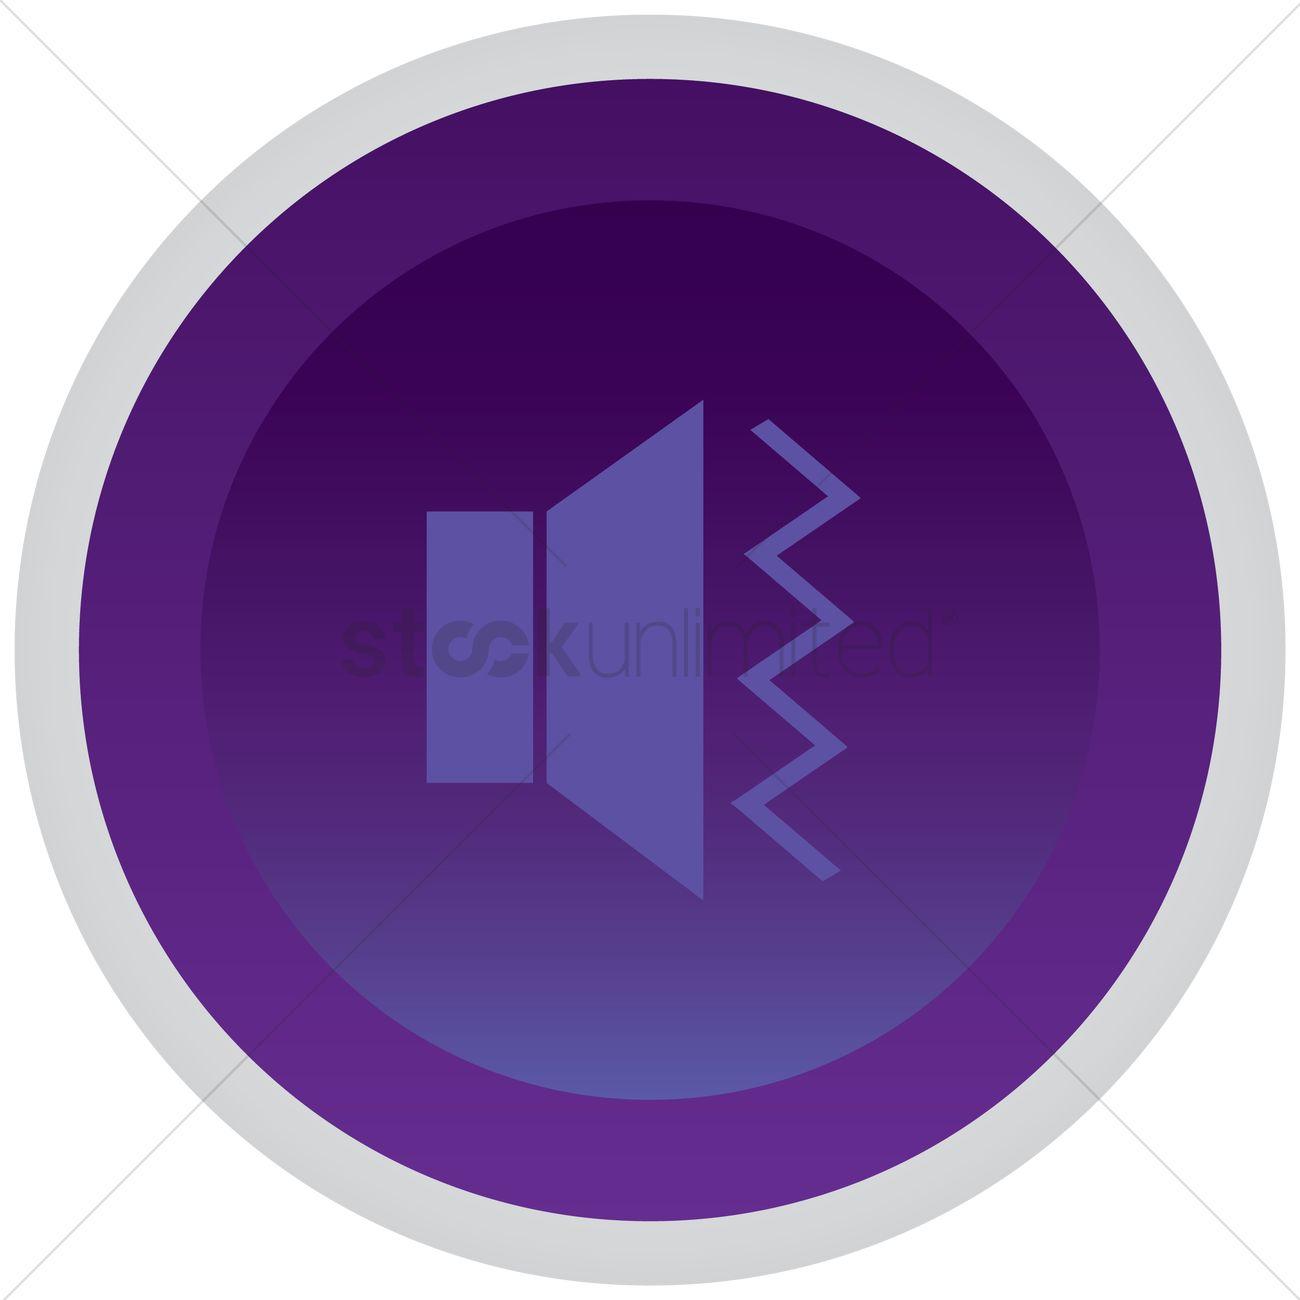 Vibration symbol button Vector Image - 1365905 | StockUnlimited